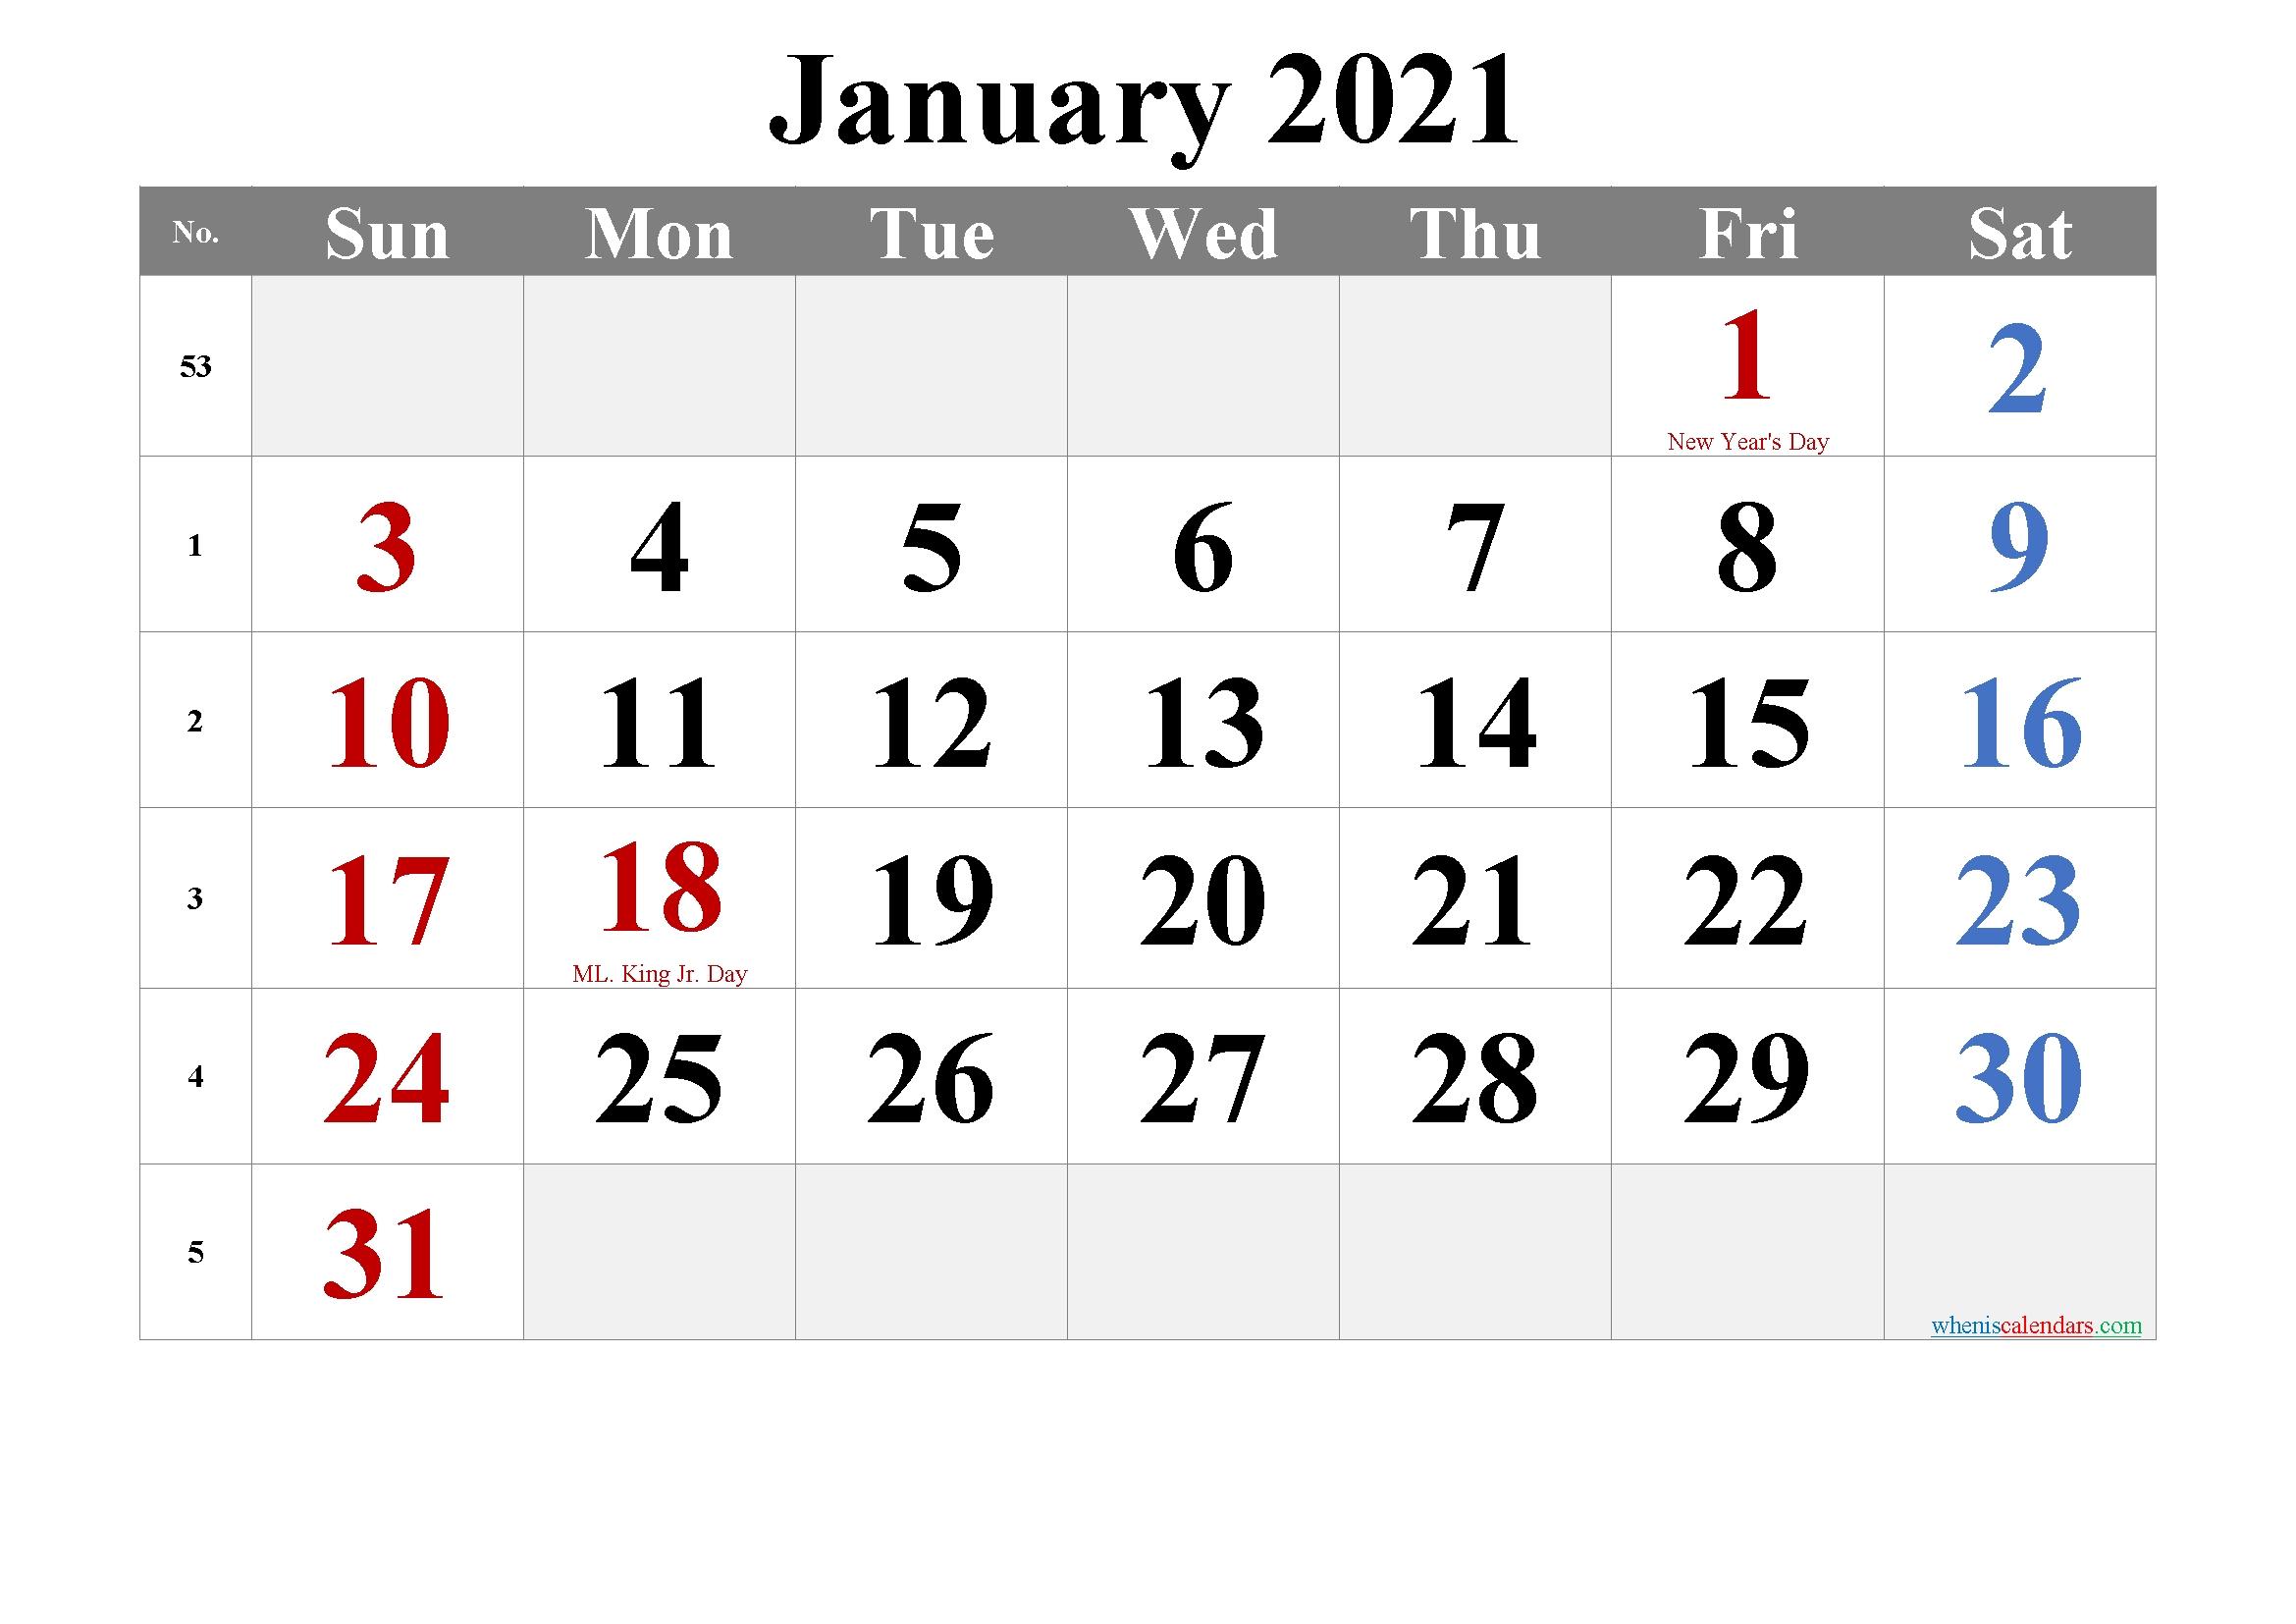 December 2021 Printable Calendar With Holidays - 6 Templates   Free Printable 2020 Calendar With Printable January Through December 2021 Calendar